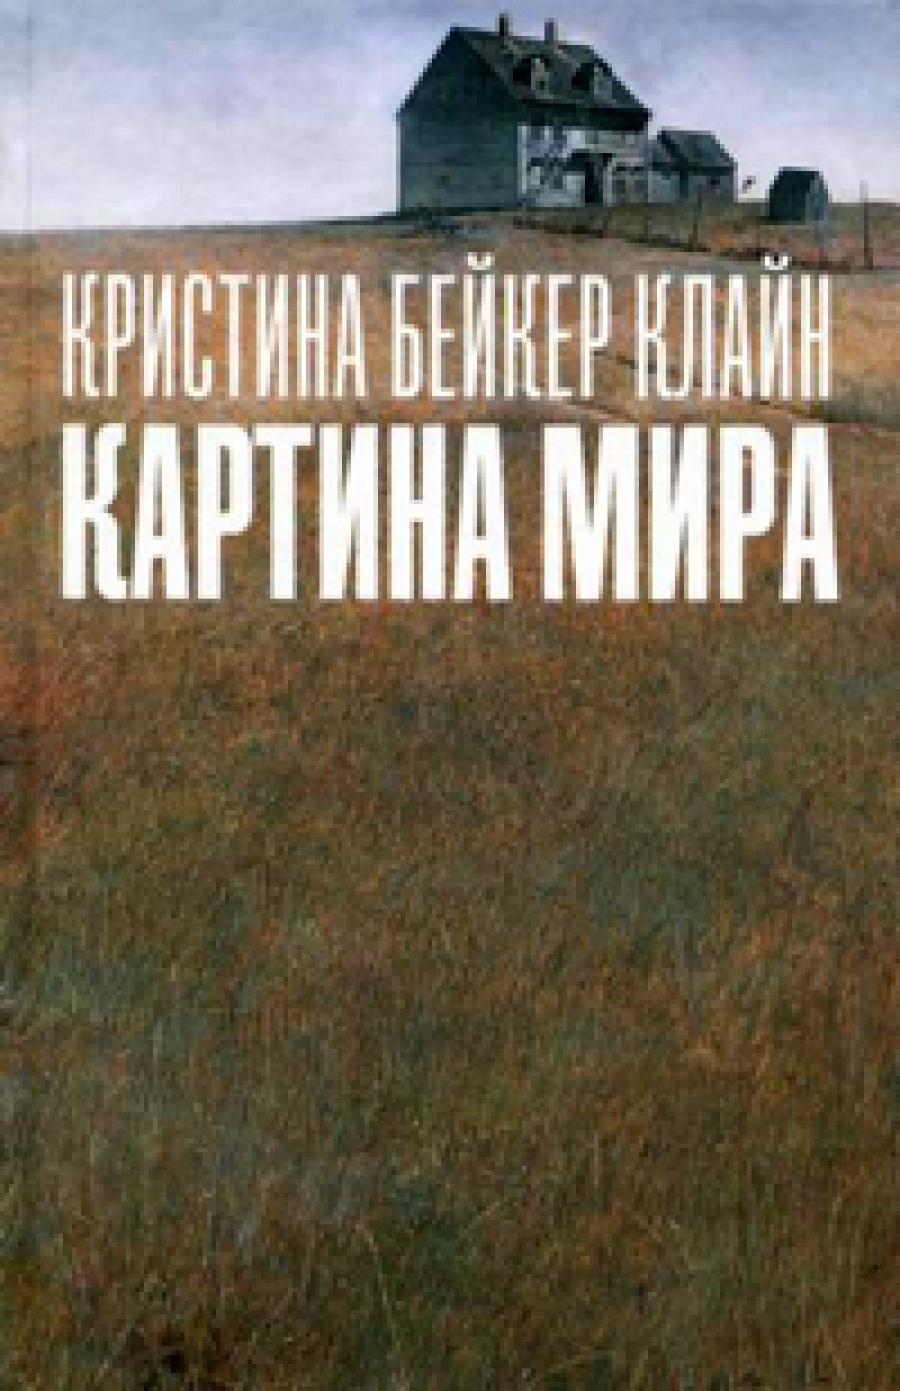 Кристина Бейкер КЛАЙН. Картина мира